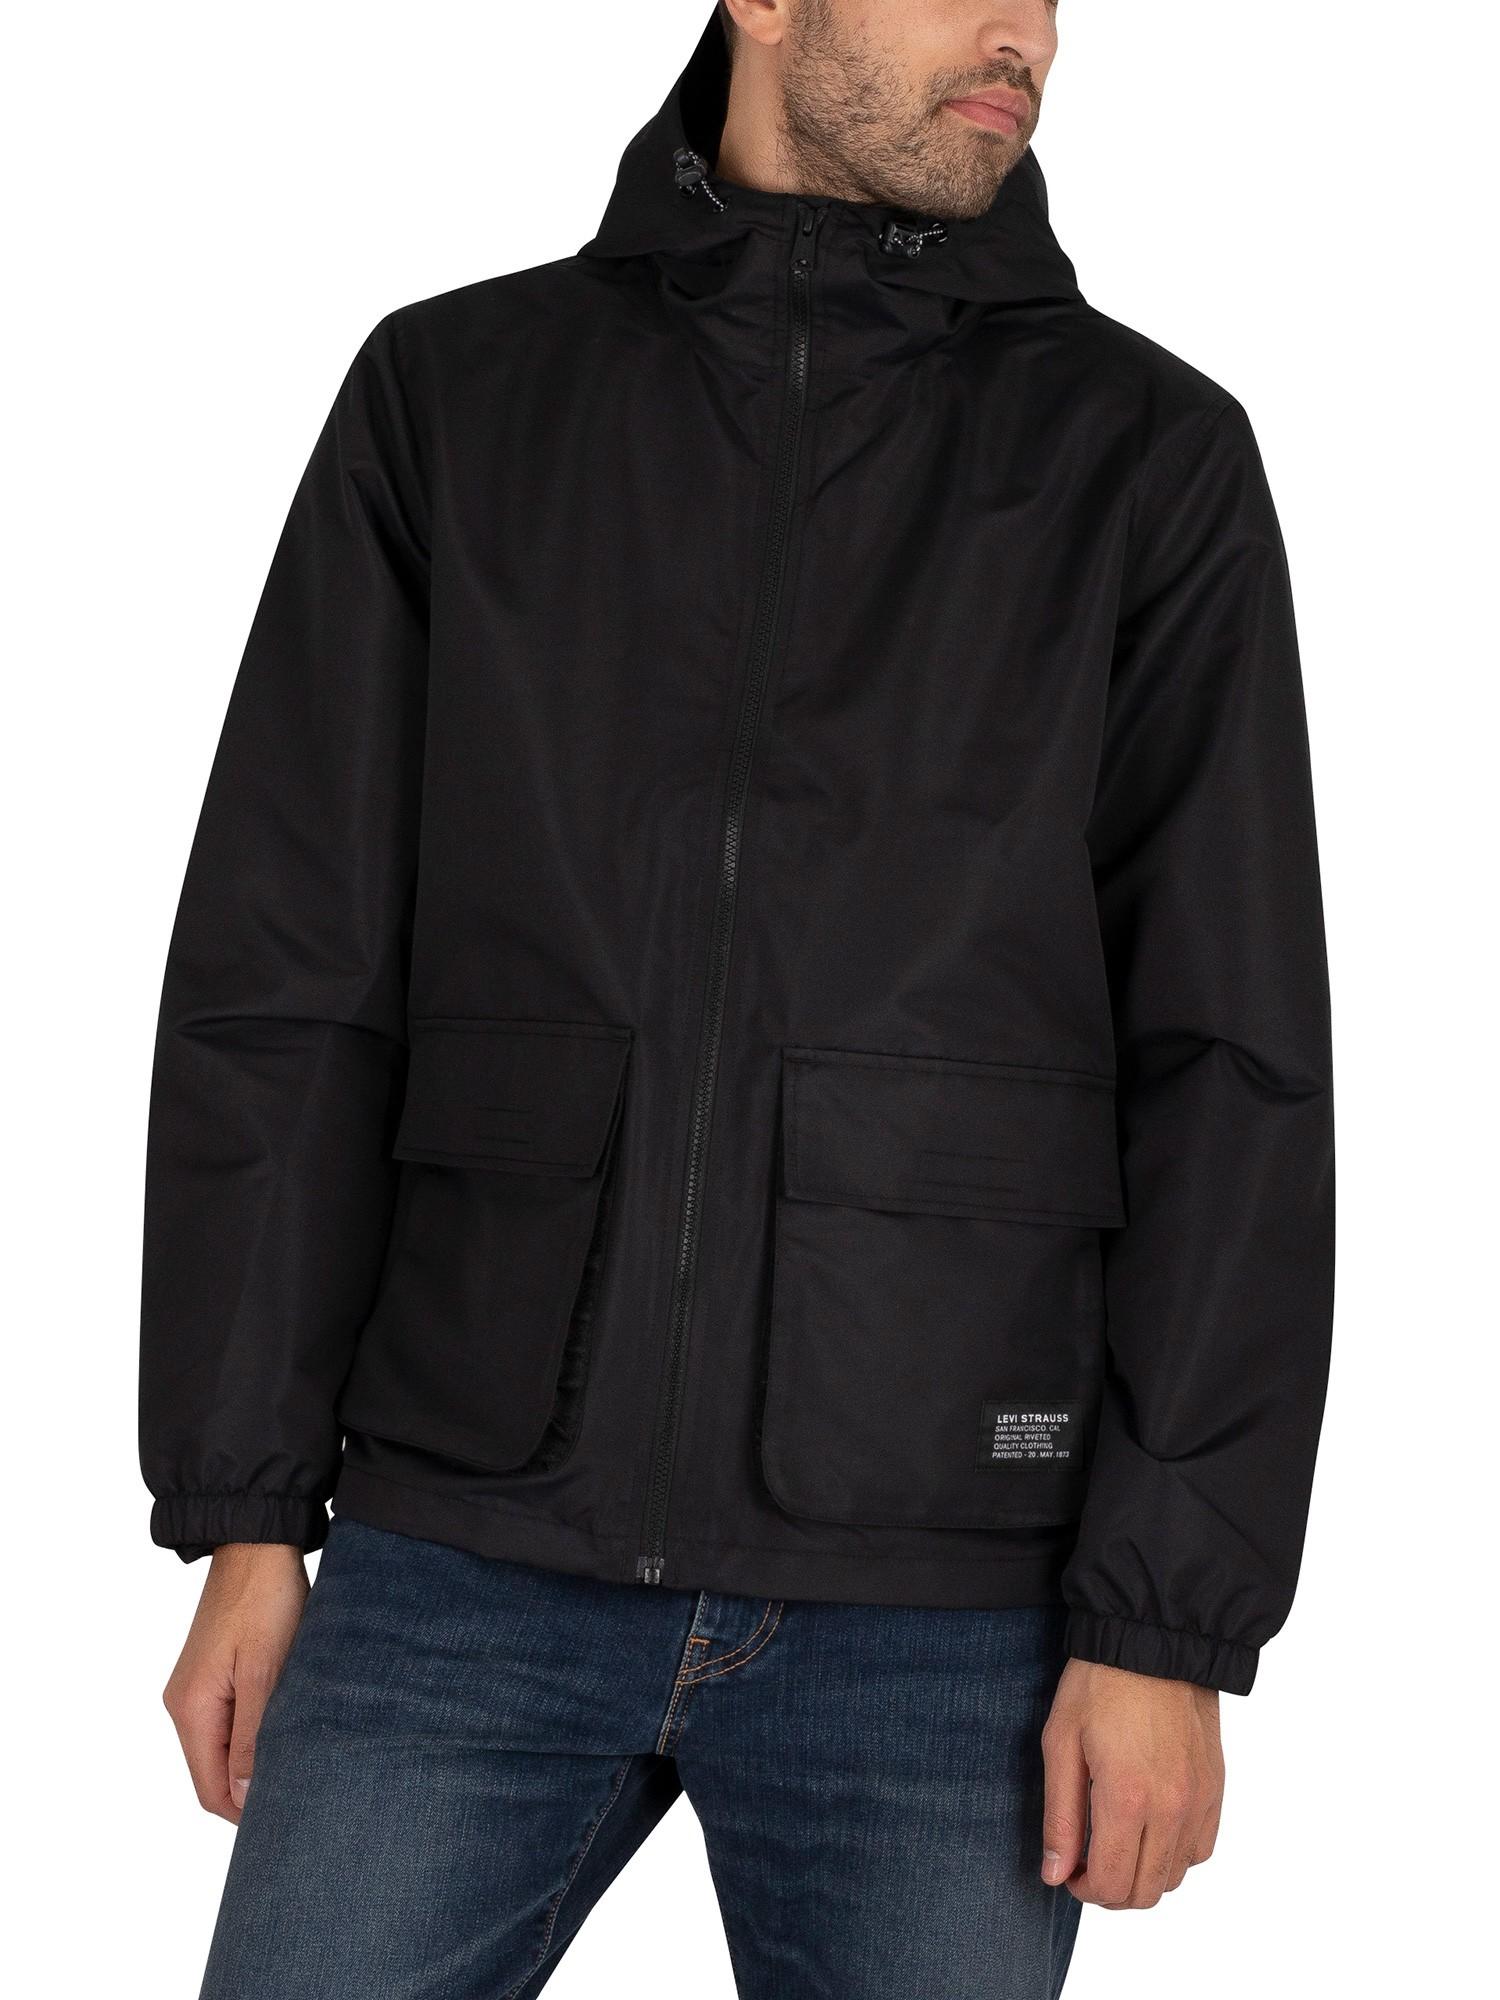 Tactical Windbreaker Jacket